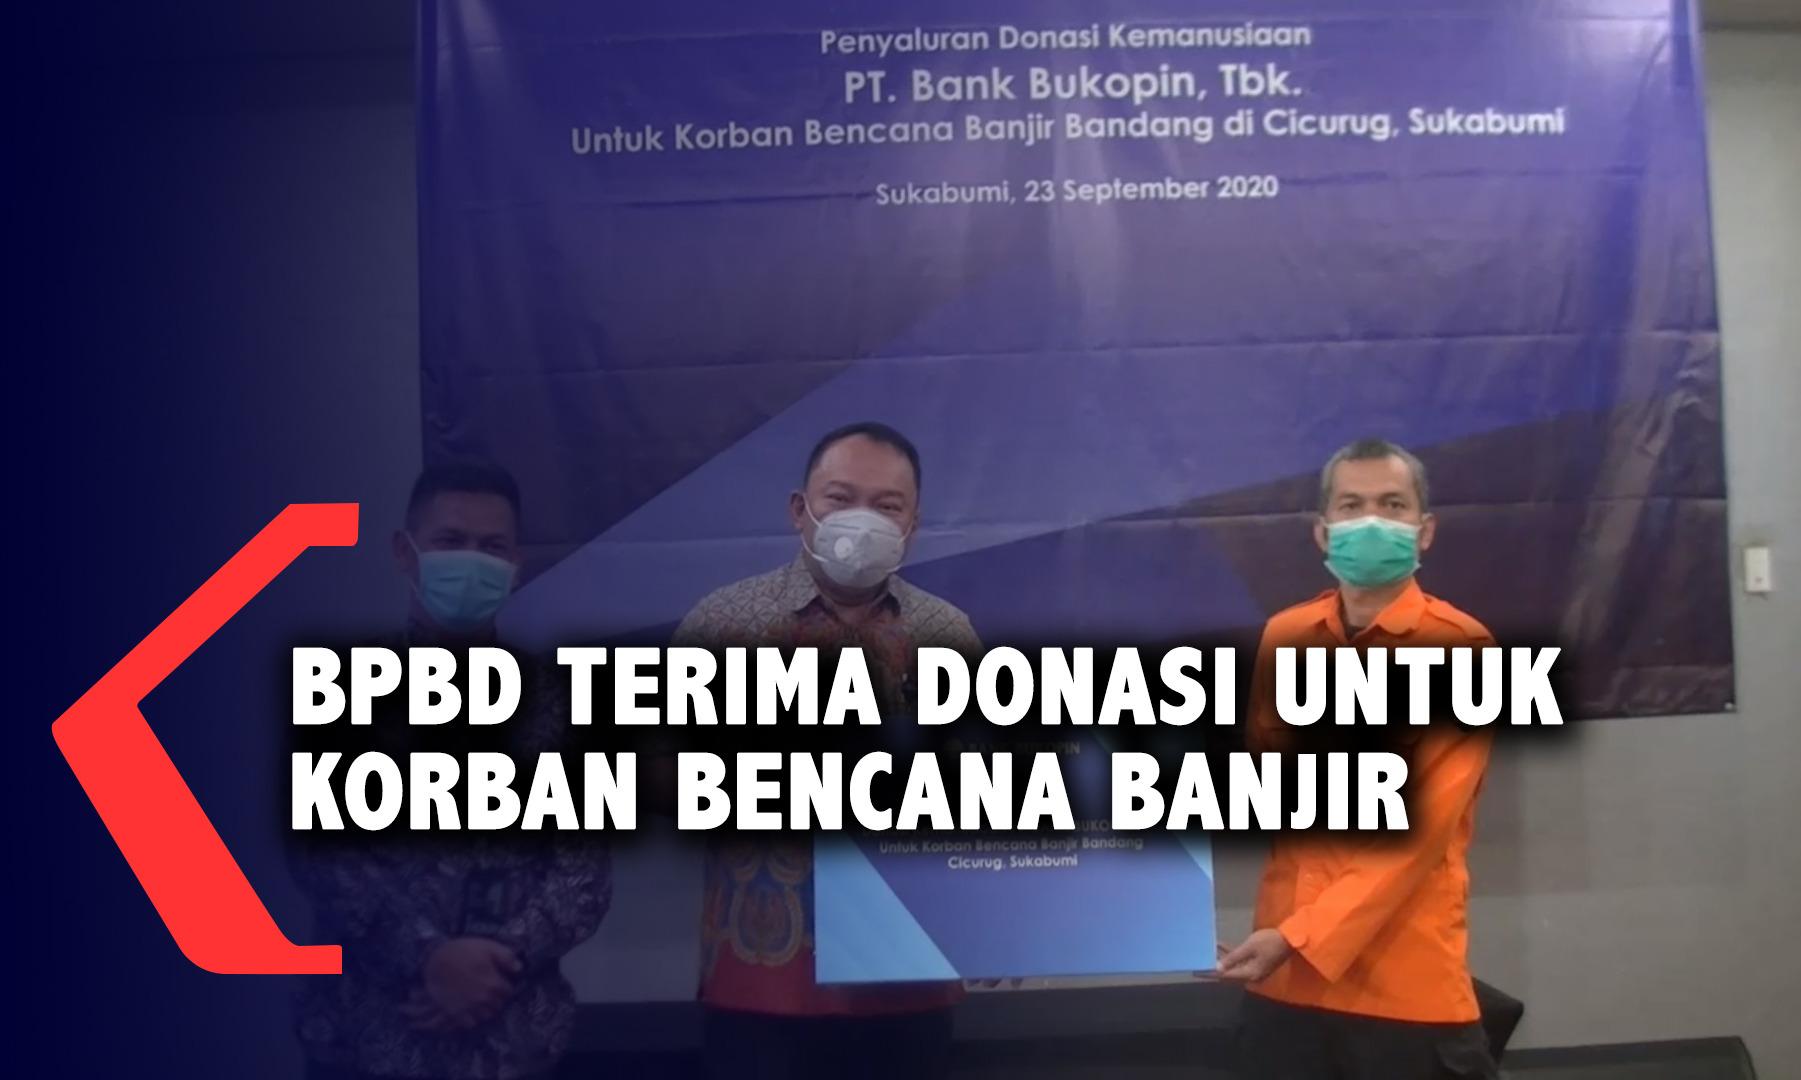 bpbd-terima-donasi-untuk-korban-bencana-banjir